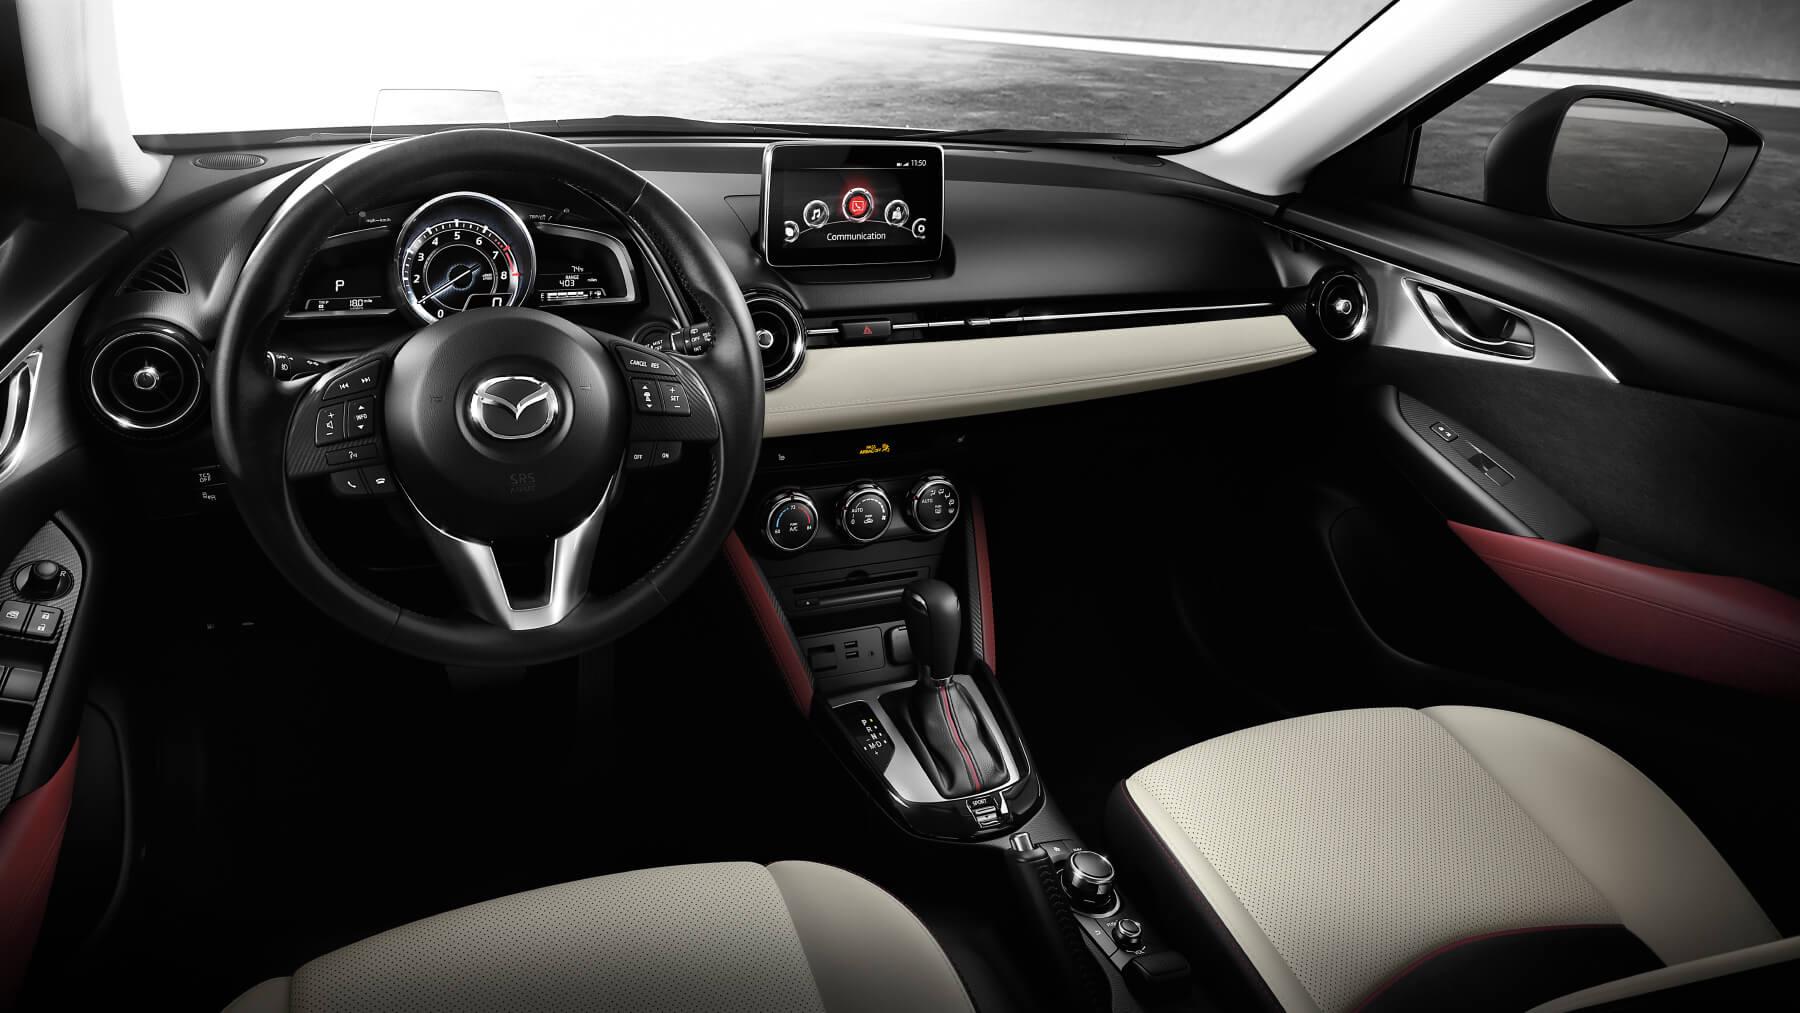 Mazda cx 3 crossover subcompacto 2017 utilitarios compactos mazda usa for Mazda 3 2017 hatchback interior